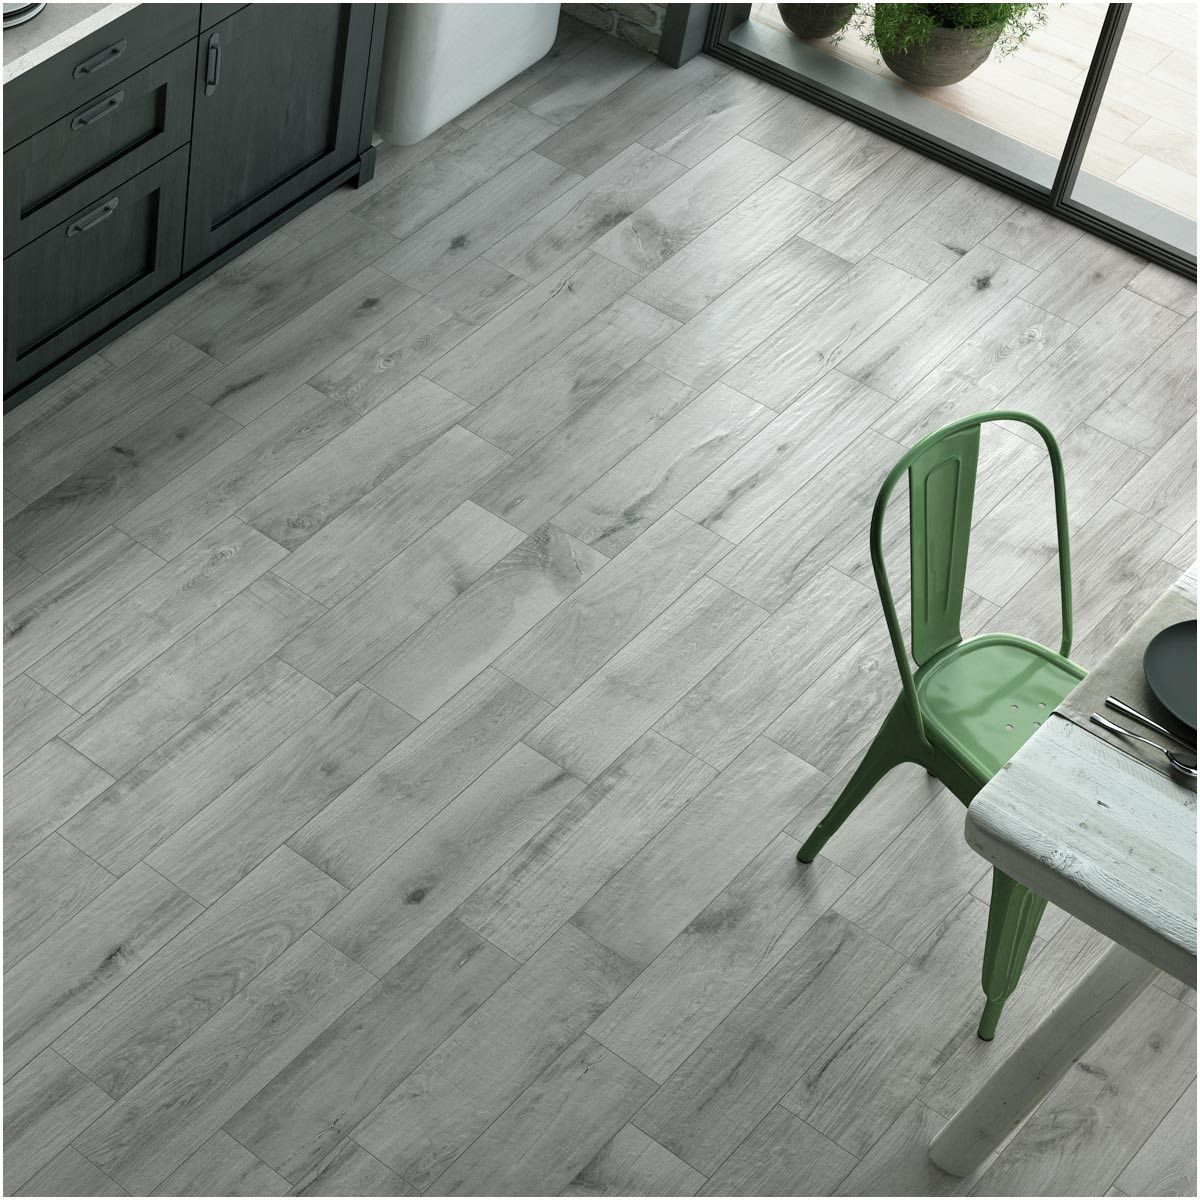 hardwood floor vs tile of porcelain floor tiles pros and cons od grain tile bathroom wood with porcelain floor tiles pros and cons od grain tile bathroom wood shower no grout porcelain pros